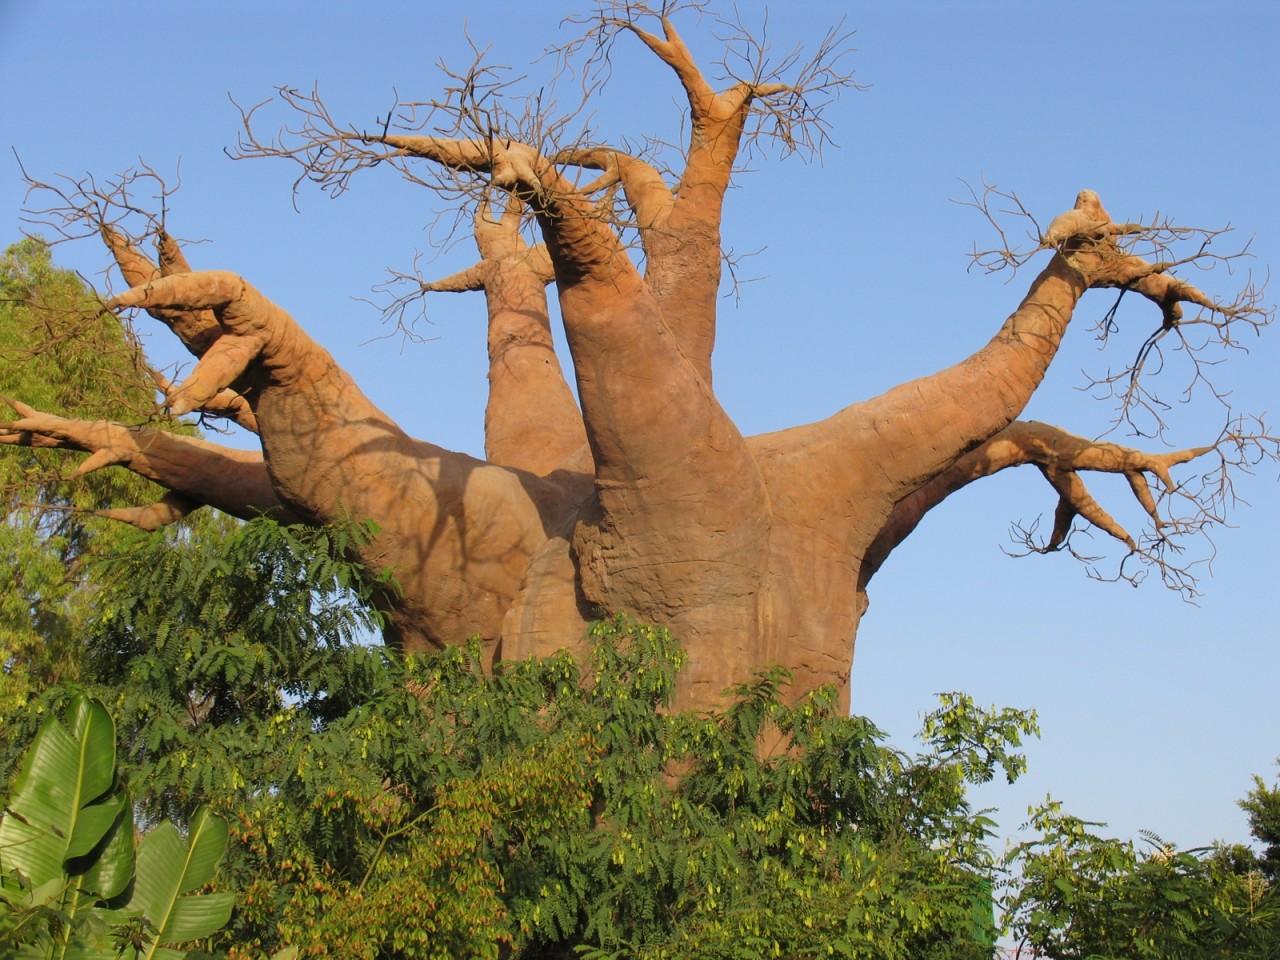 http://respekt.crimea.ua/uploads/content/images/madagascar-baobab-tree(1).jpg